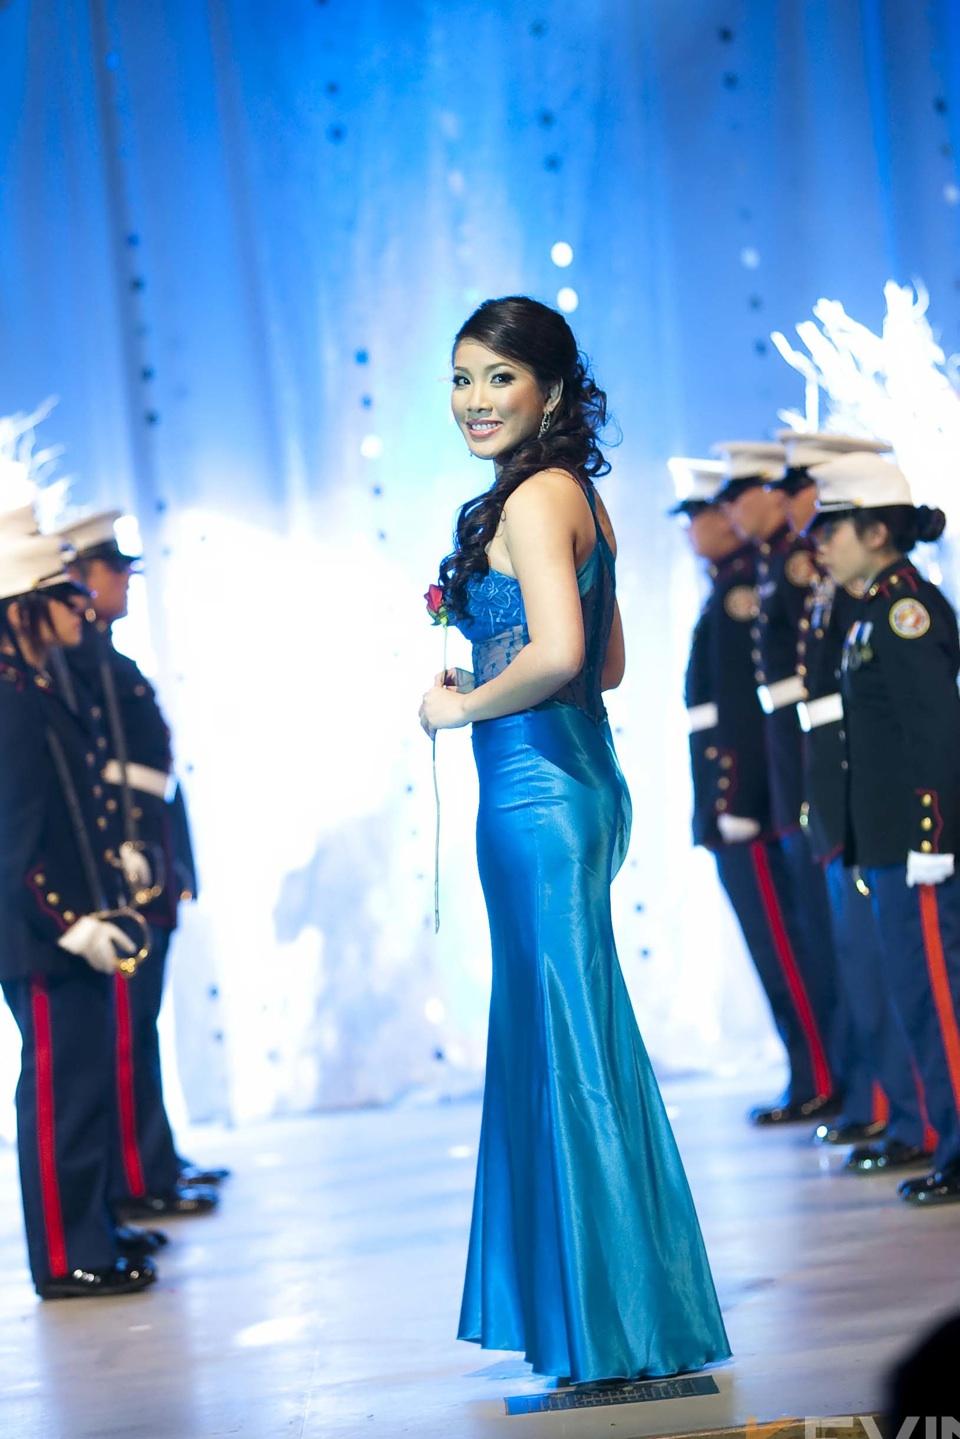 Miss Vietnam - Hoa Hau Ao Dai Bac Cali 2010 - Pageant Day - Image 061